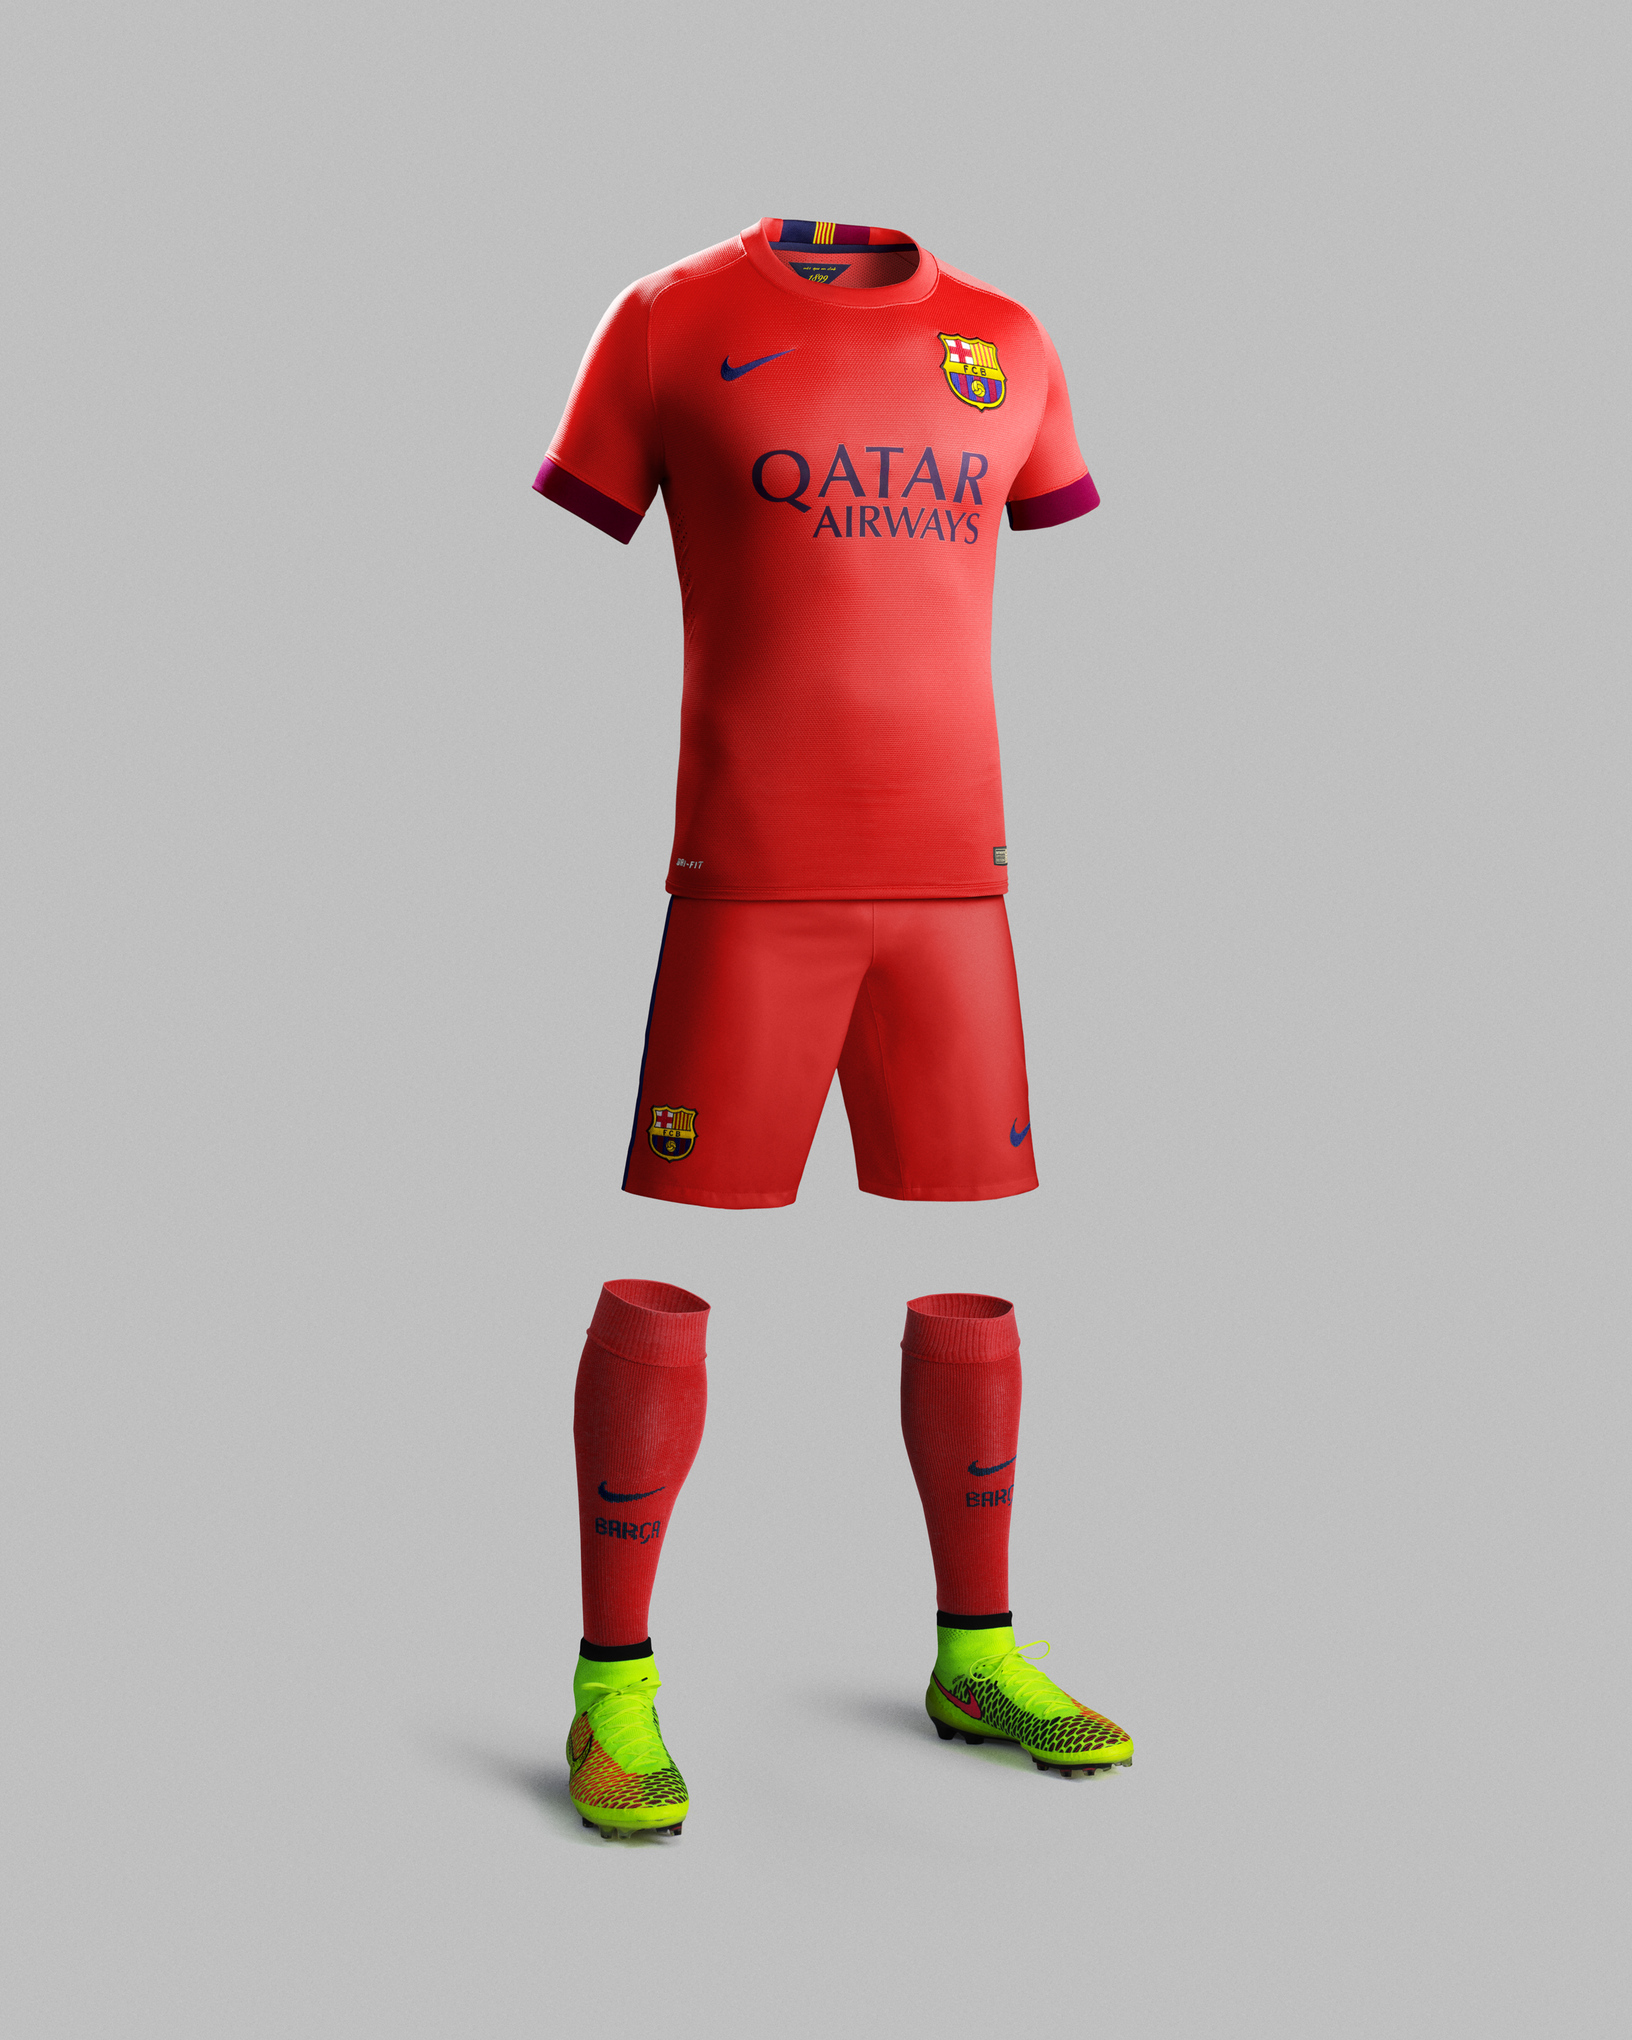 3acb56b1e Fa14 match barcelona pr a full body r original medium. The shorts that  accompany the away ...